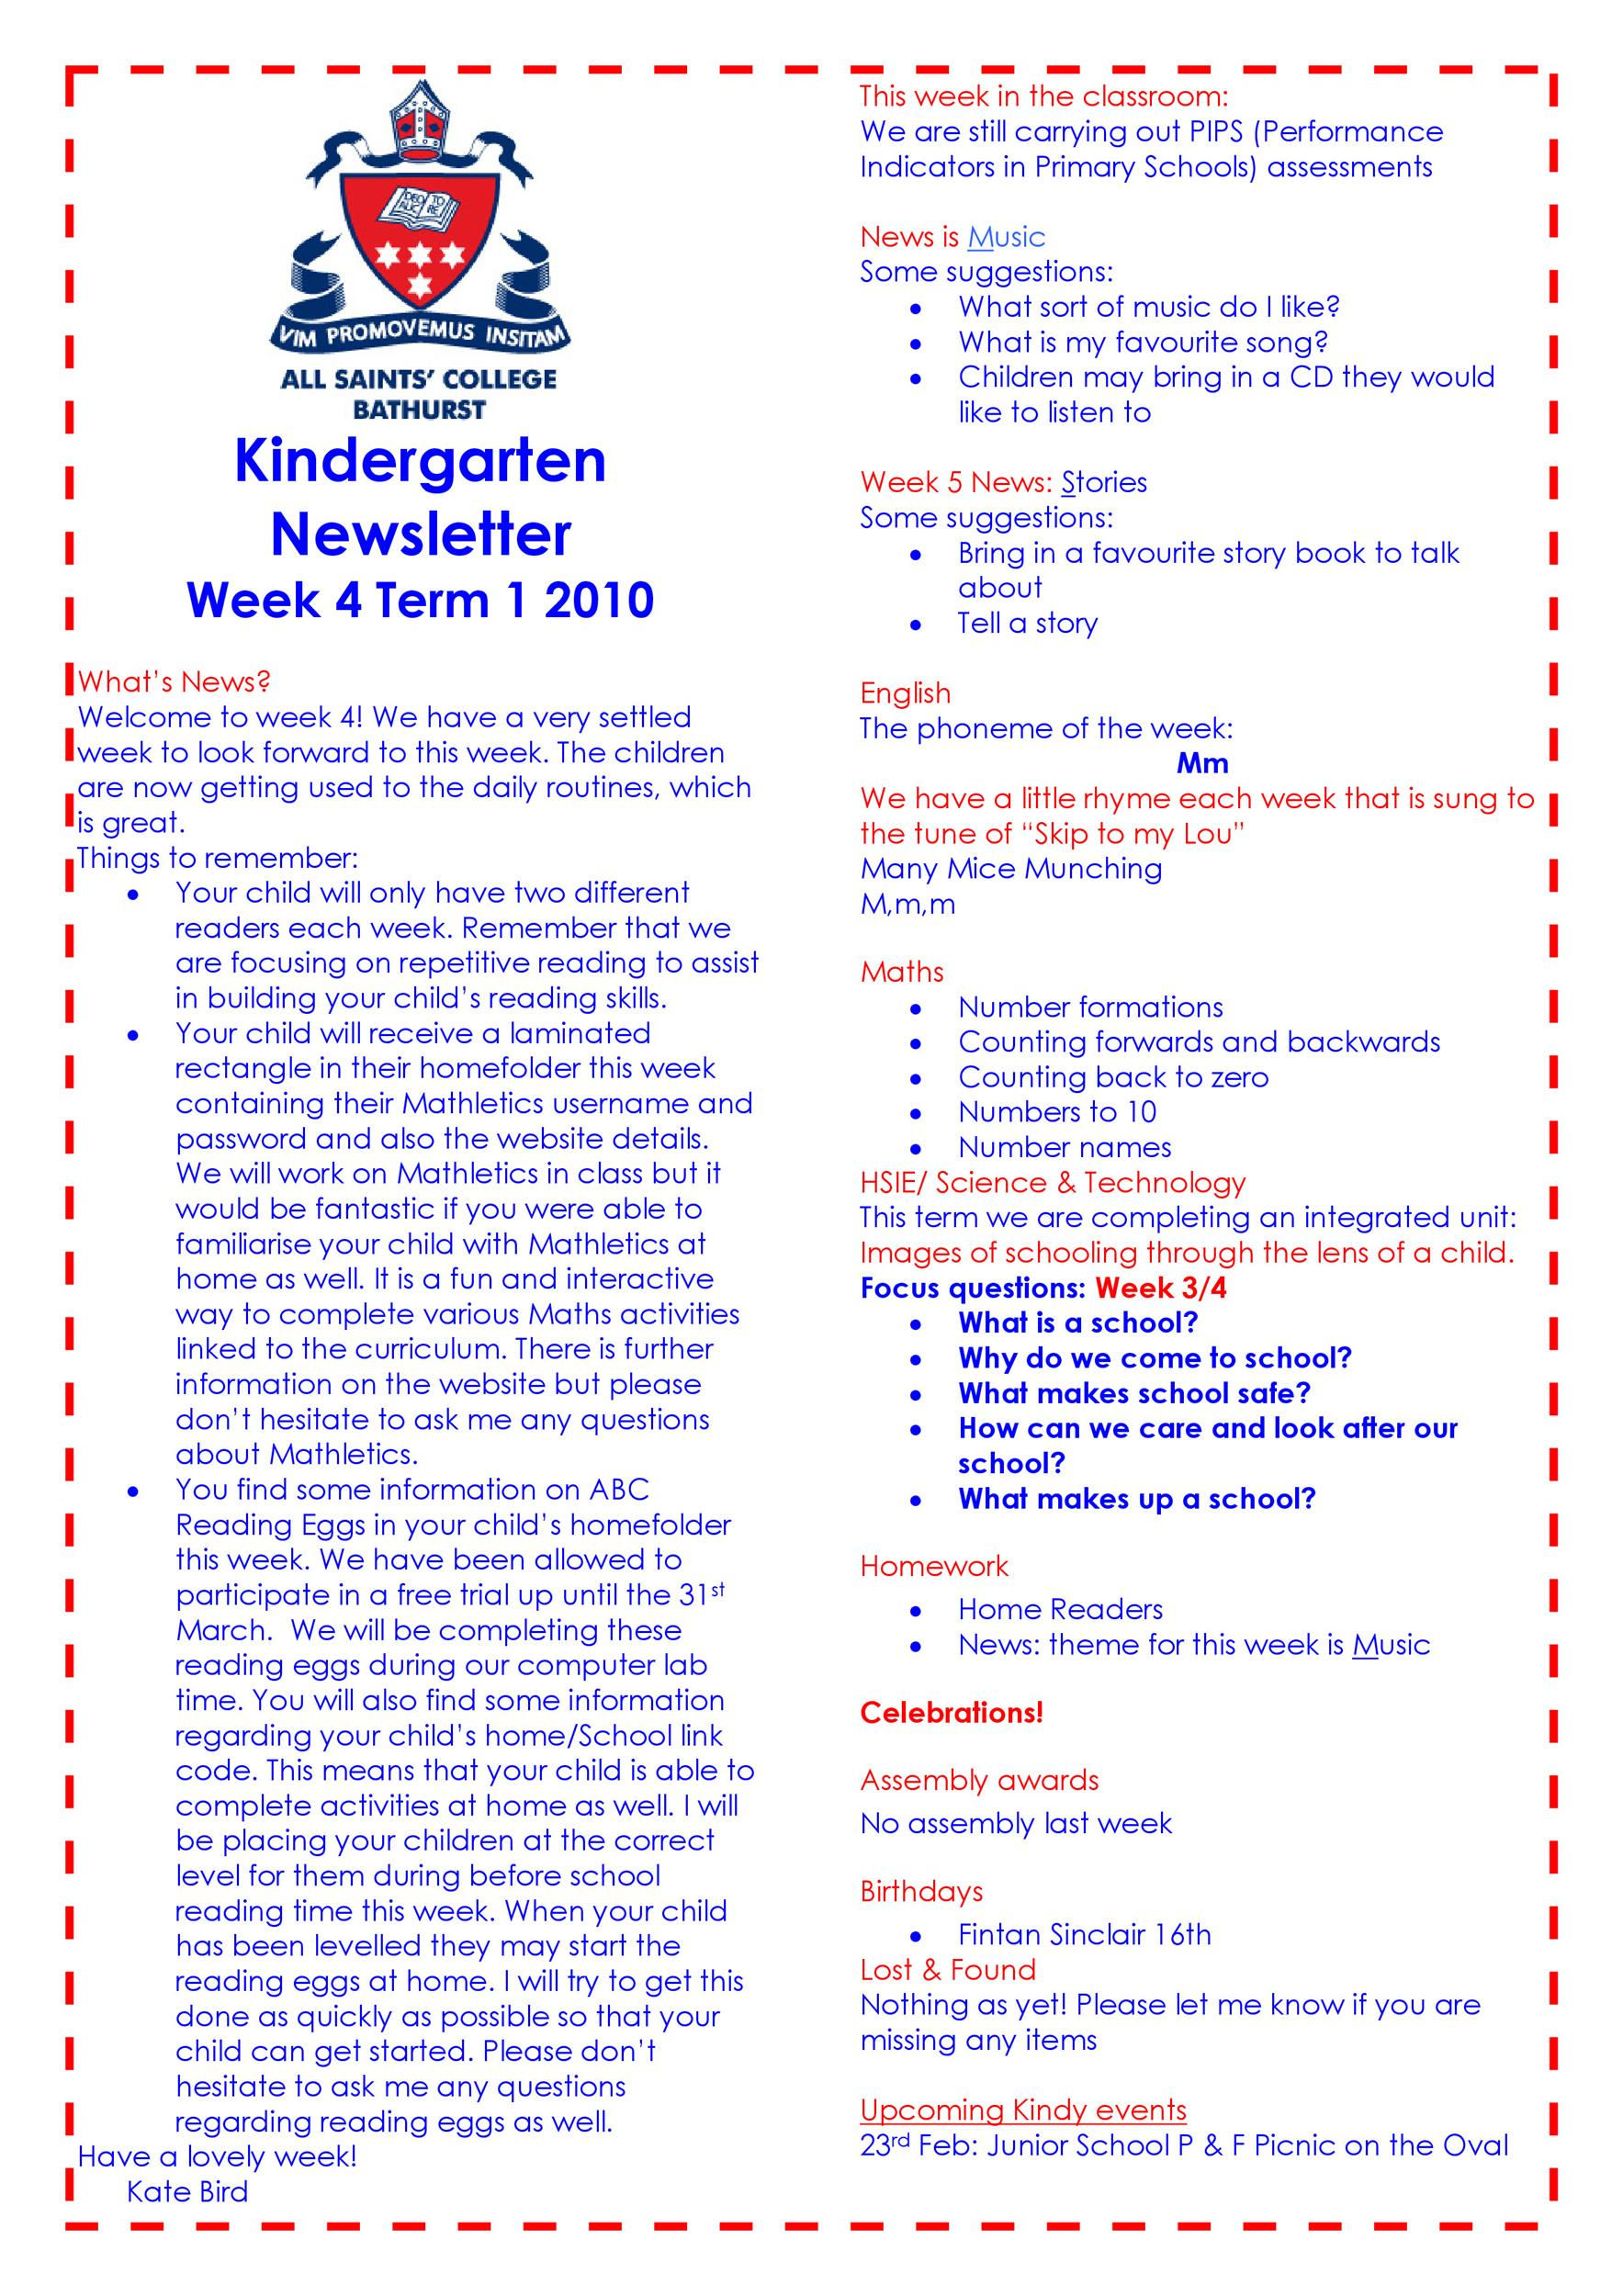 Free preschool newsletter template 15